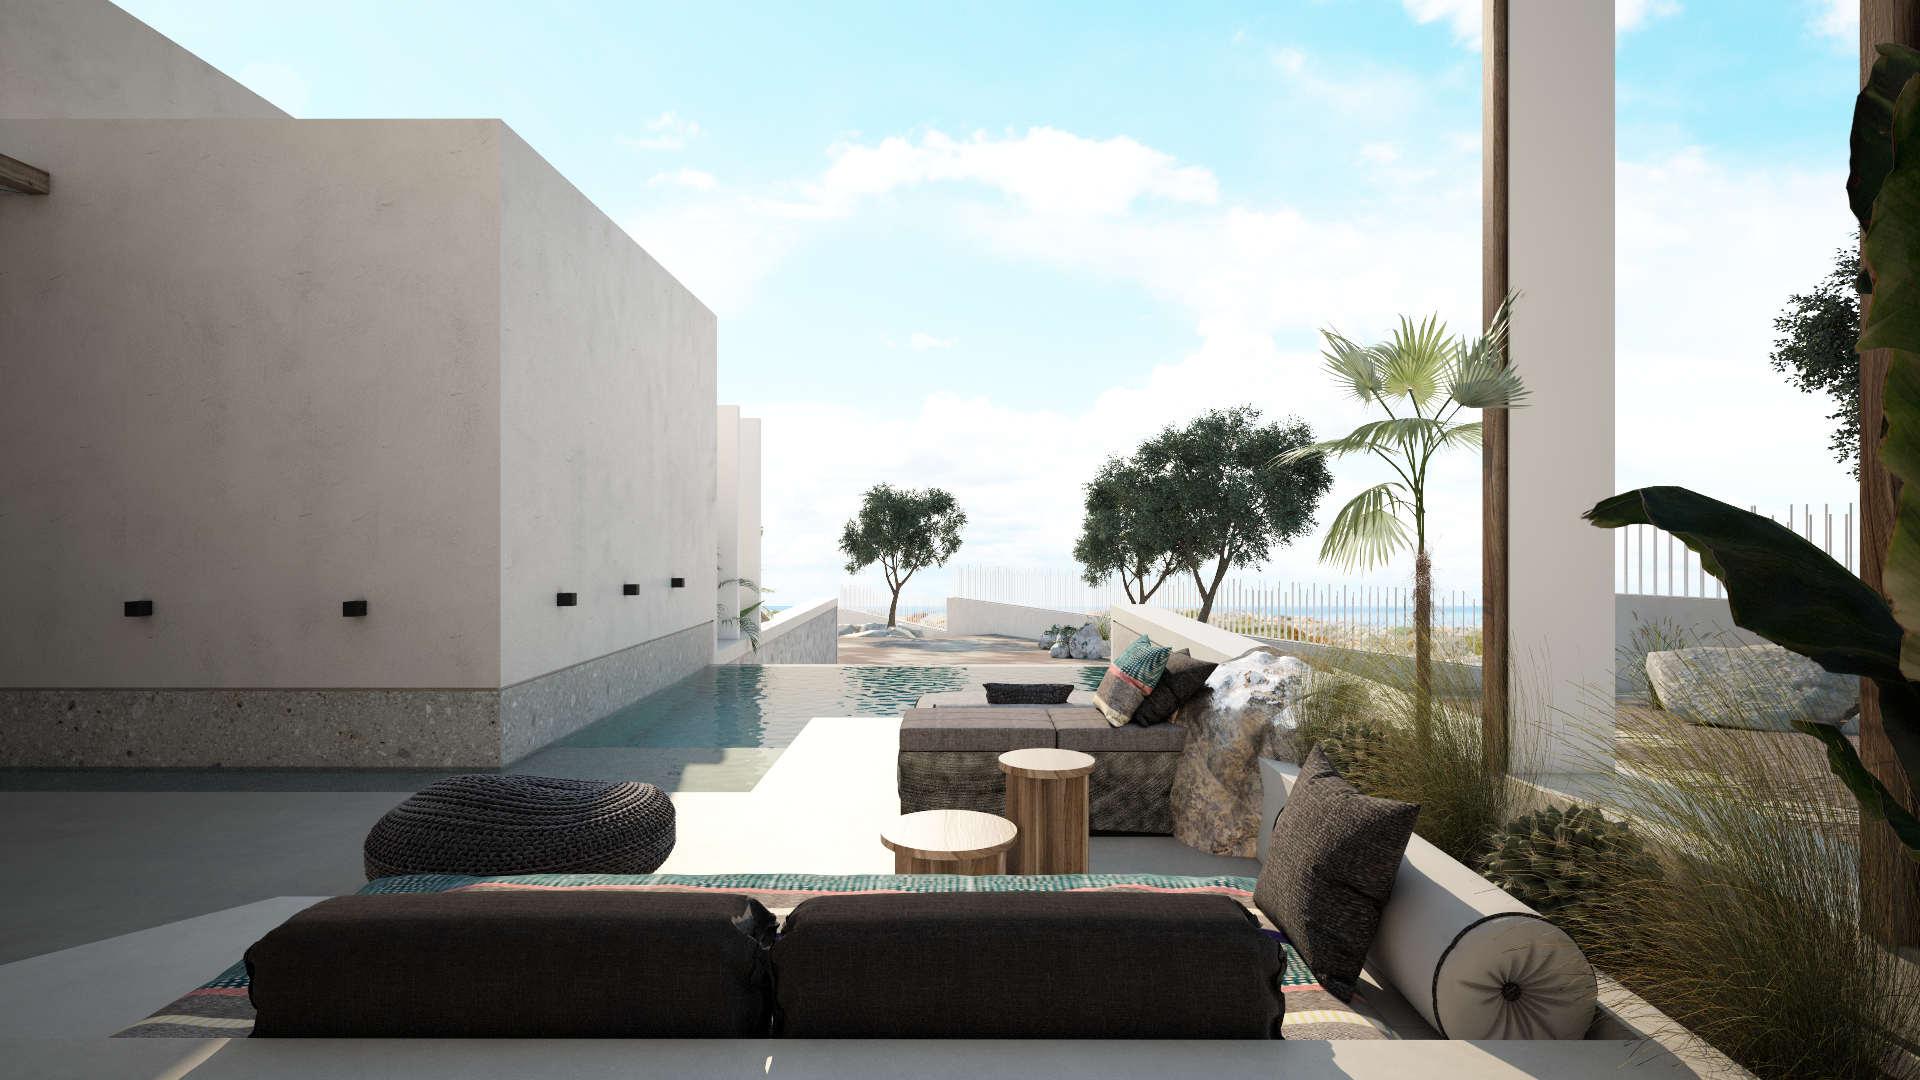 hotel renovation, exterior design, pool, ανακαίνιση ξενοδοχείου, εξωτερικός χώρος δωματίου με πισινα